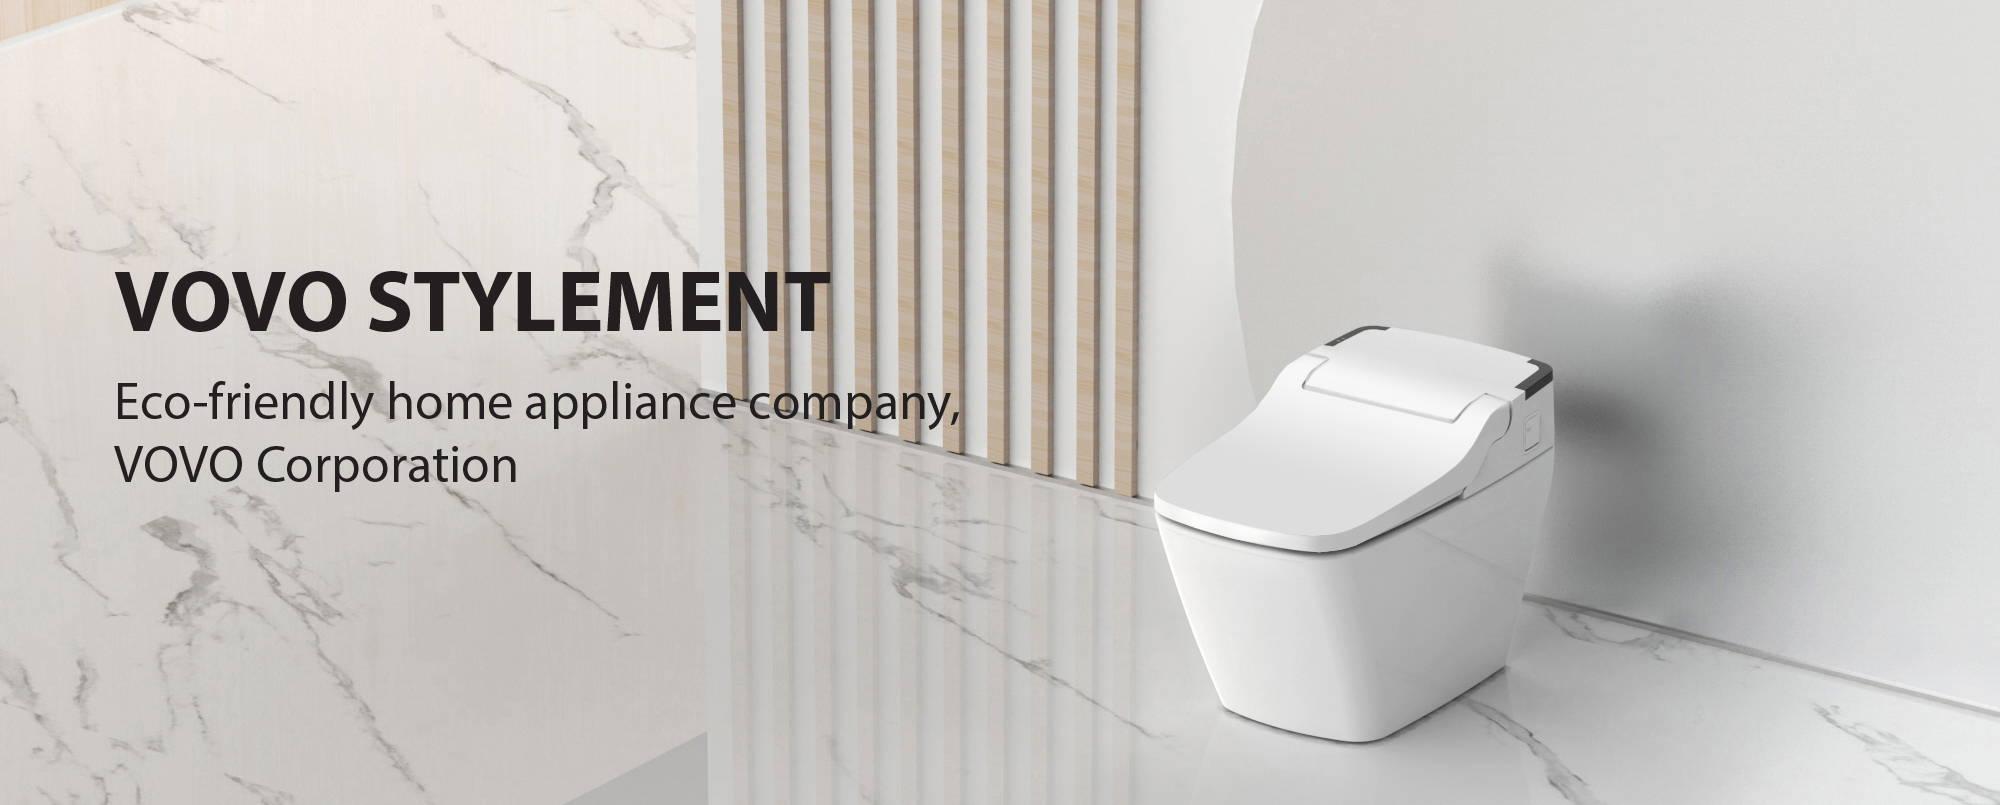 Eco friendly home appliance company vovo corporation